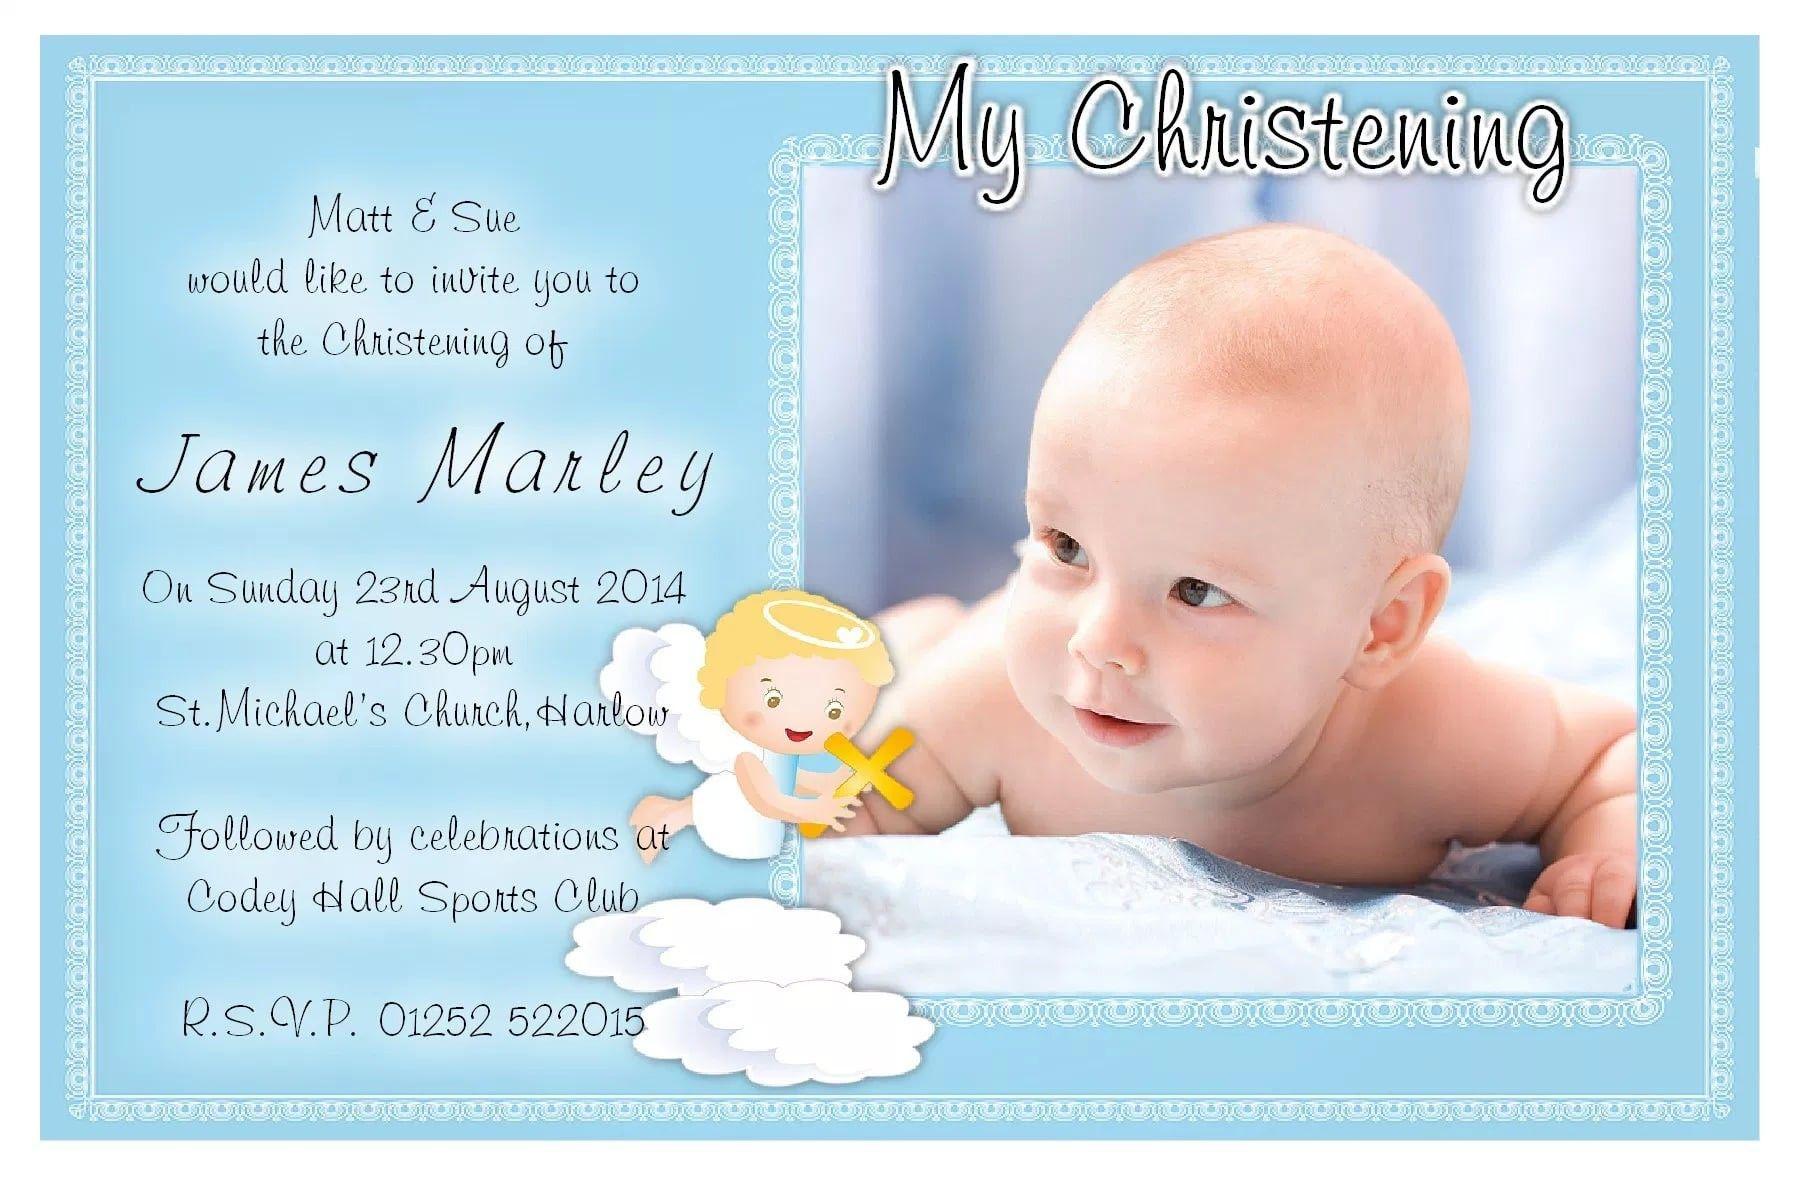 Pin by Cristy Macabata on uwiw | Baptism invitation for boys, Christening  invitations boy, Baby dedication invitation